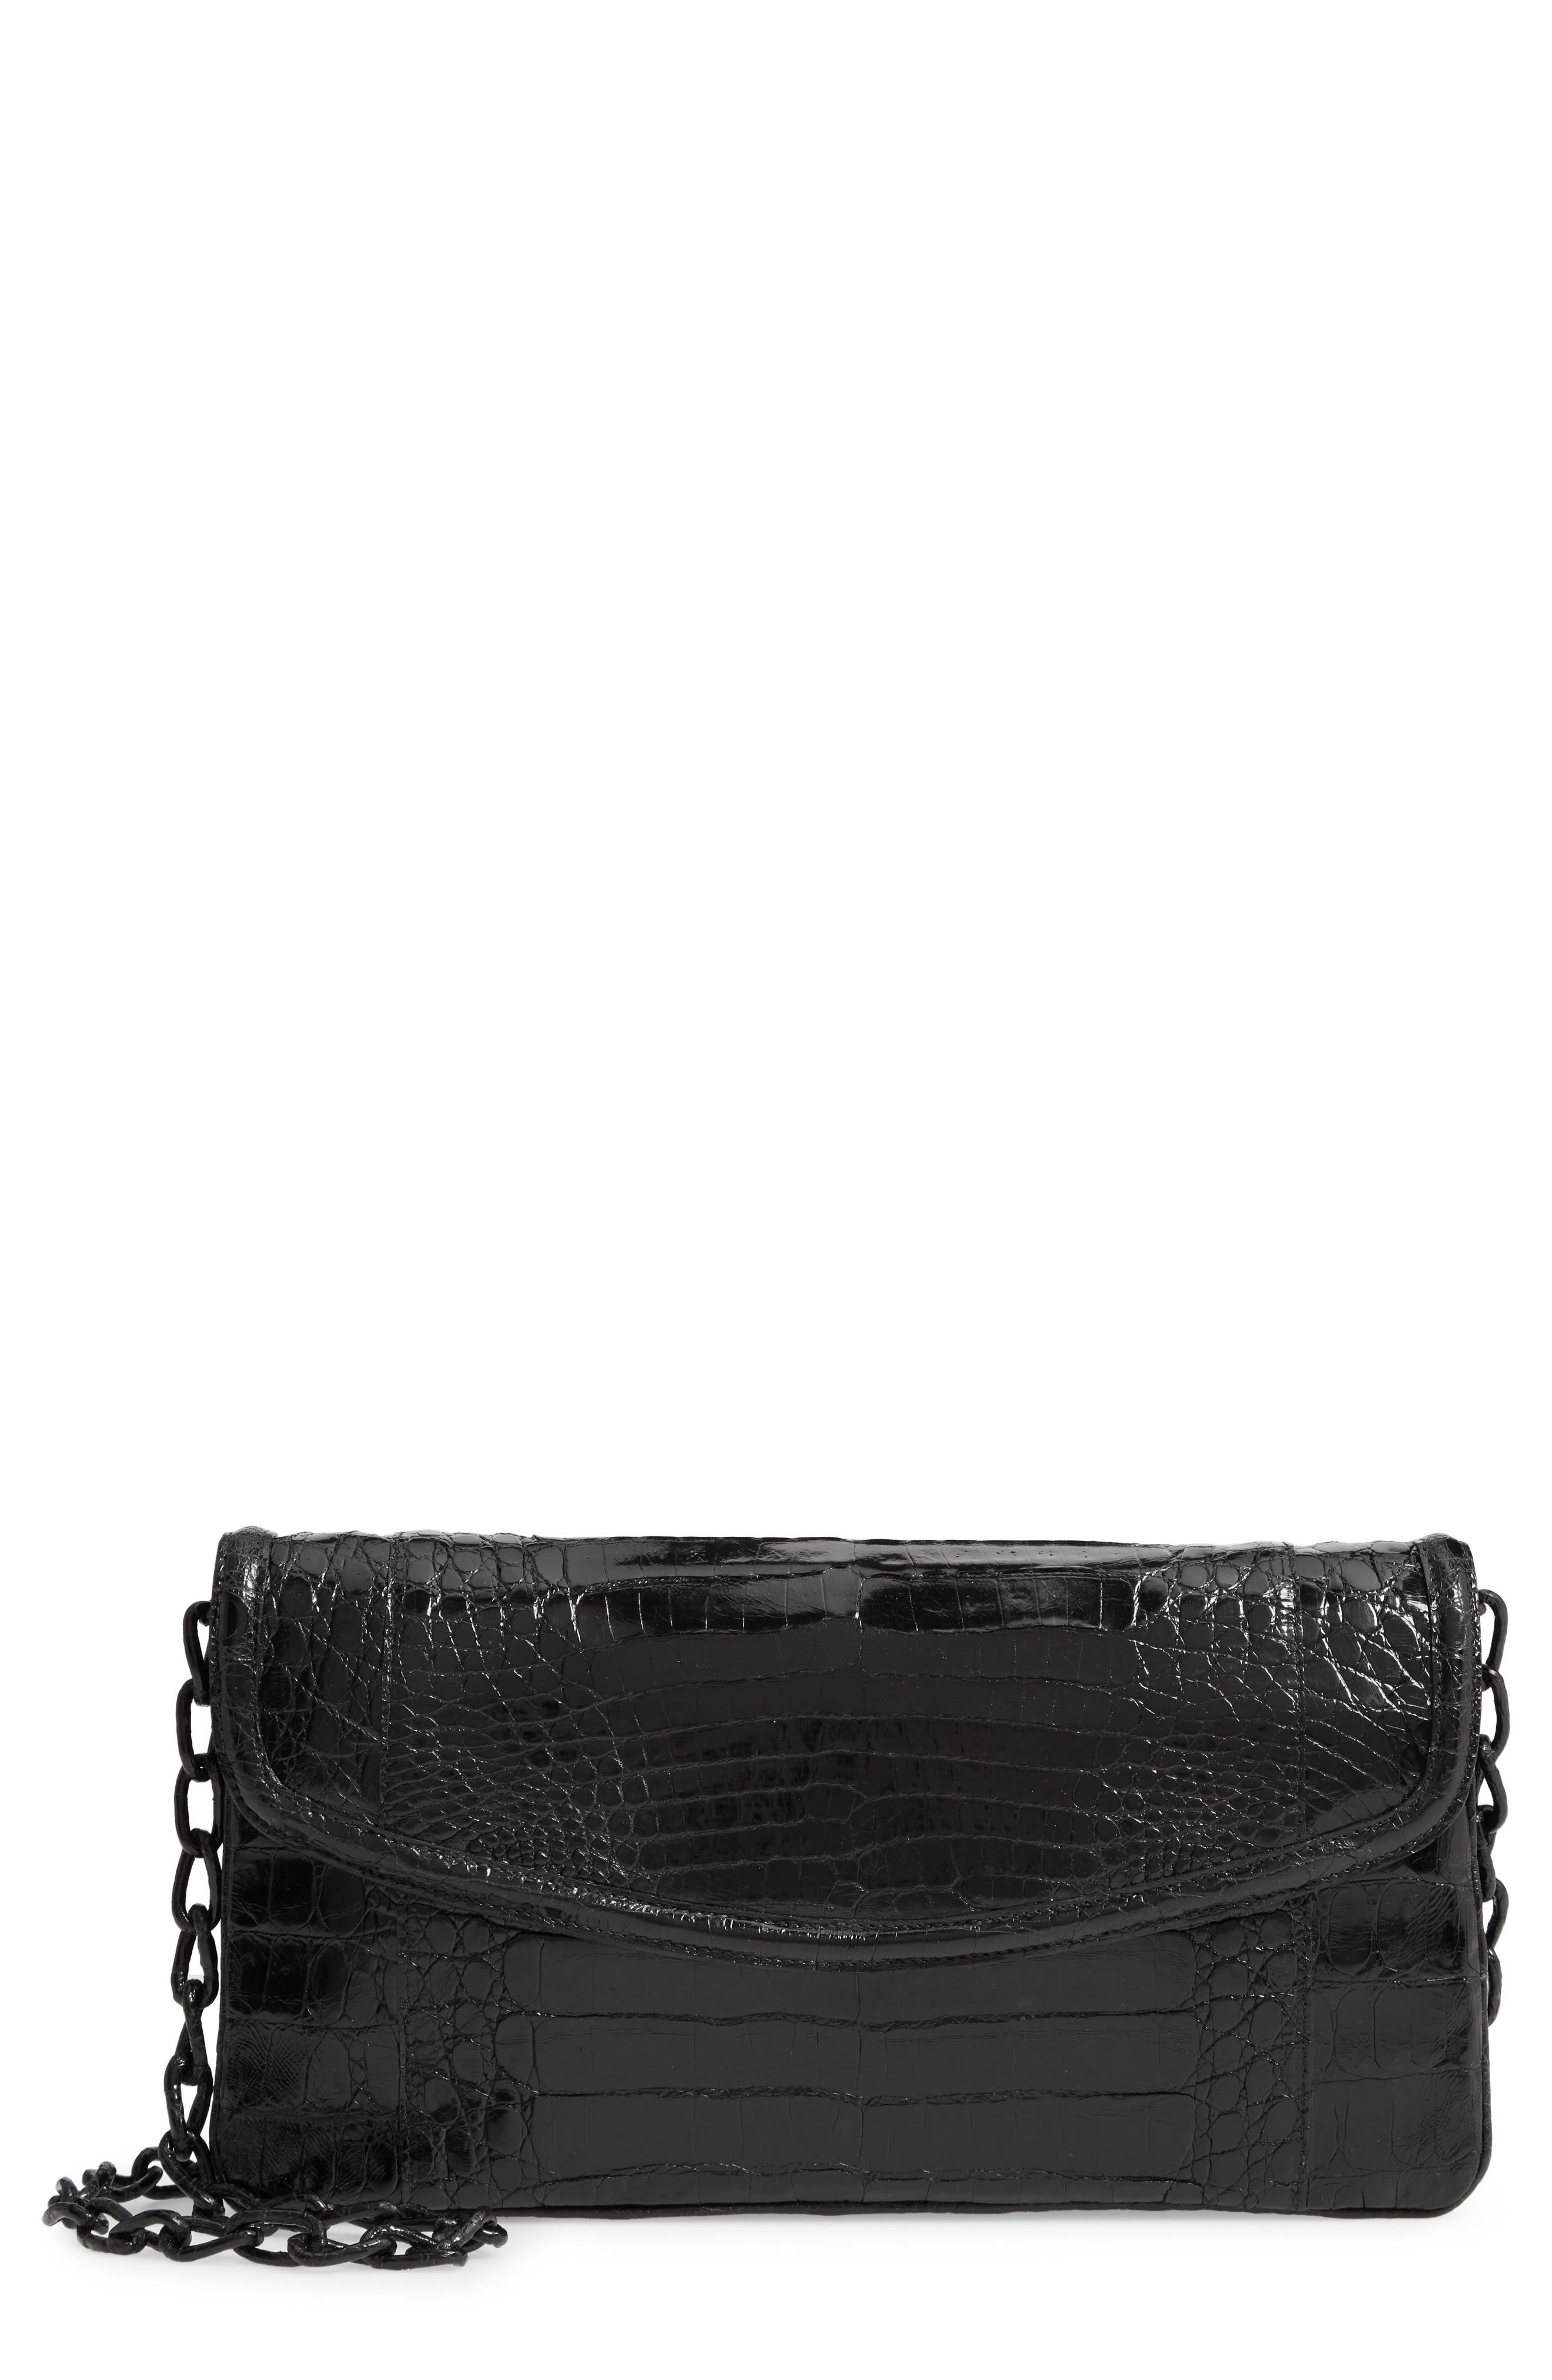 NANCY GONZALEZ, Small Genuine Crocodile Flap Clutch, Main thumbnail 1, color, BLACK SHINY